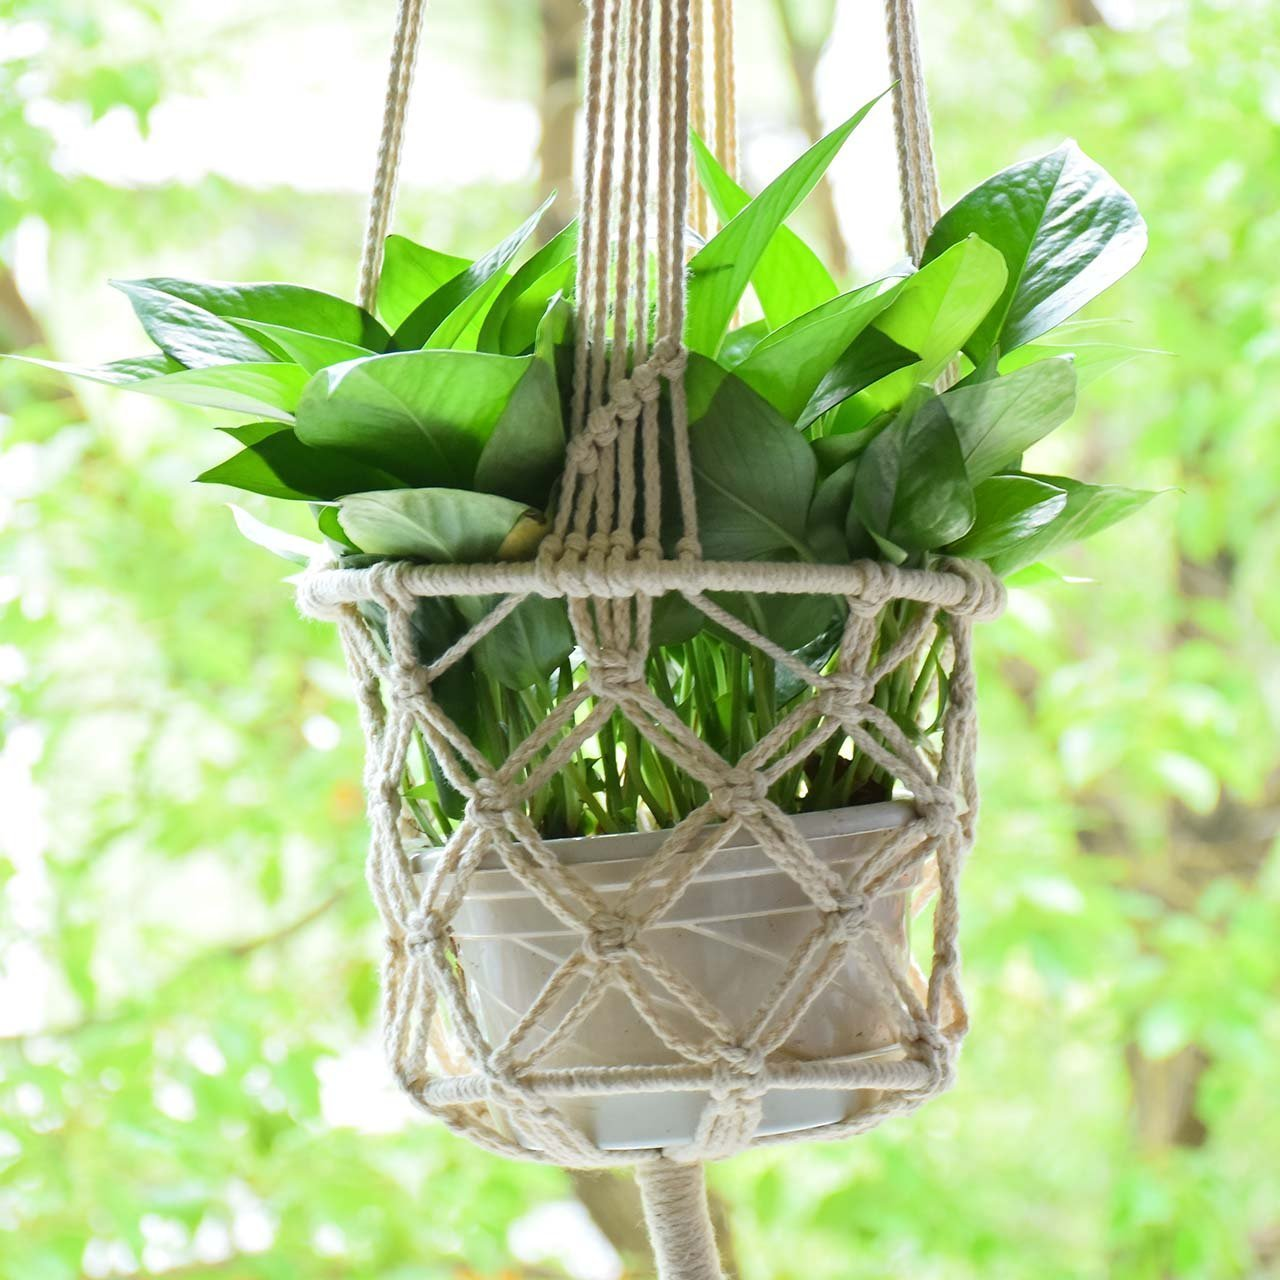 Cheap pp hanging flower pot find pp hanging flower pot deals on get quotations macrame plant hanger plant holder hanging plant pot basket rope plant pot support macrame jute hanging izmirmasajfo